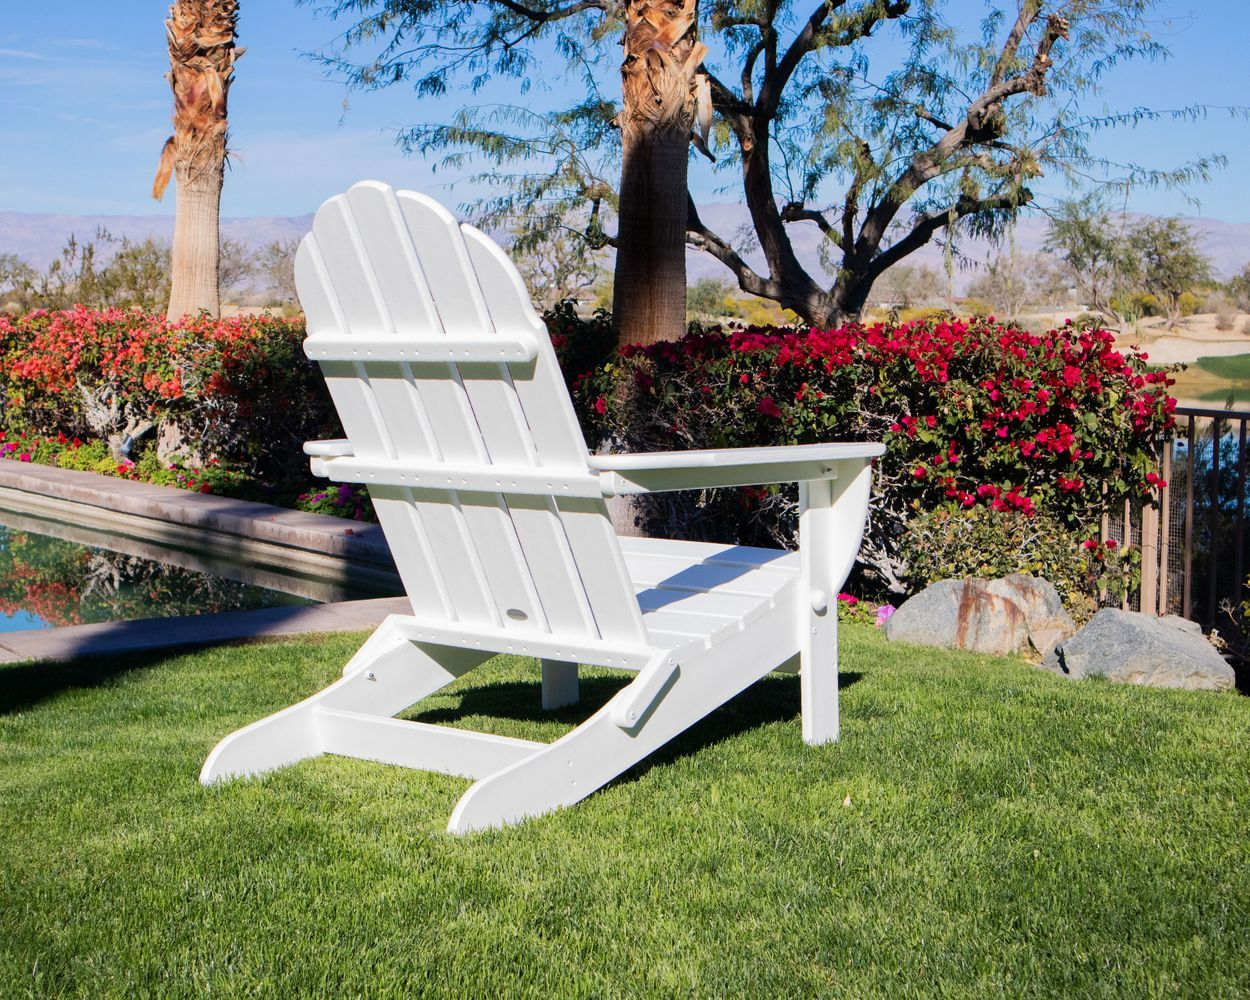 Long Beach Folding Adirondack Chair Folding Adirondack Chairs Adirondack Chair Outdoor Chairs